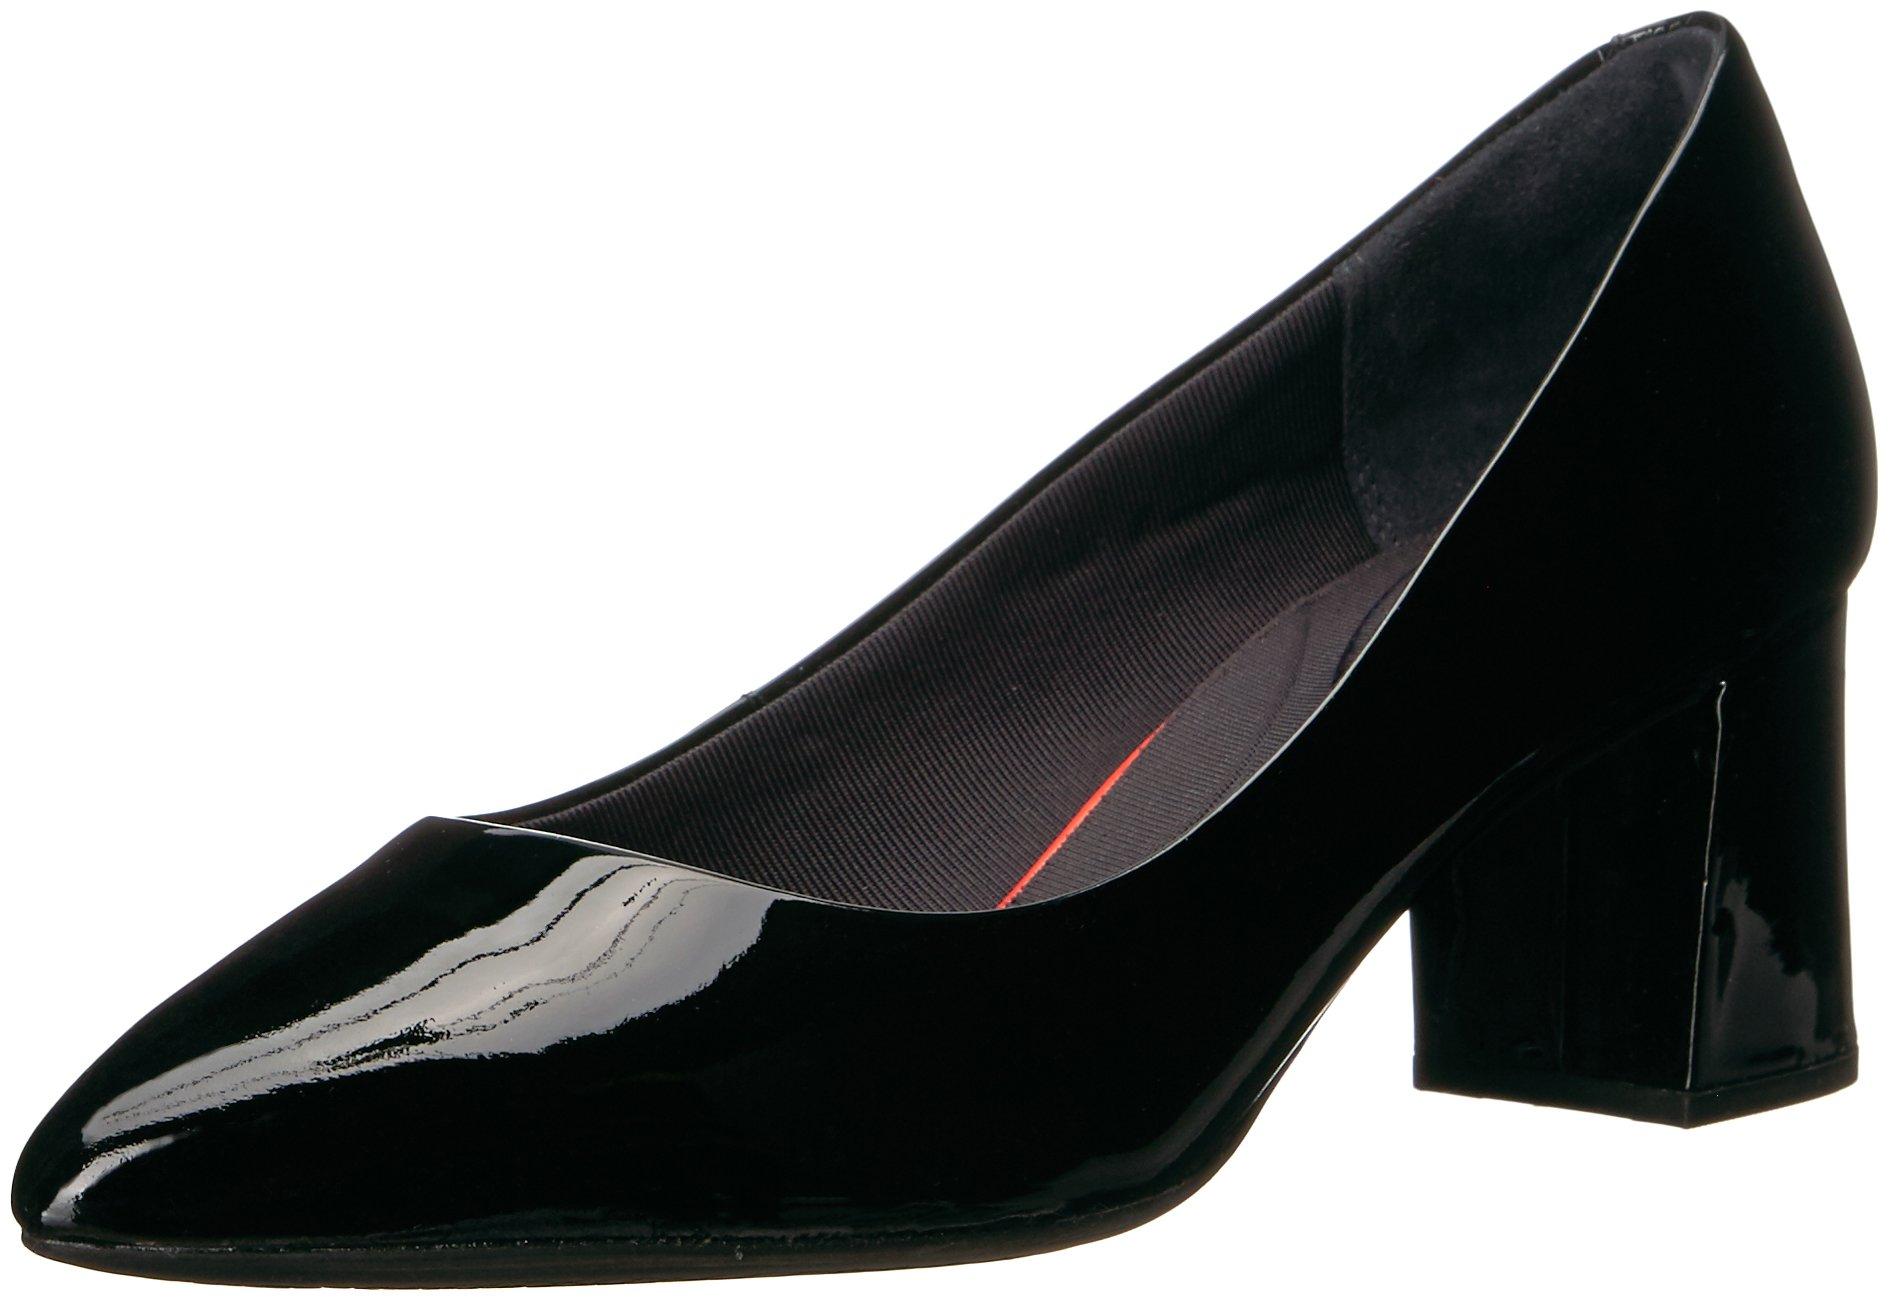 Rockport Women's Total Motion Salima Dress Pump, Black Patent, 6 M US